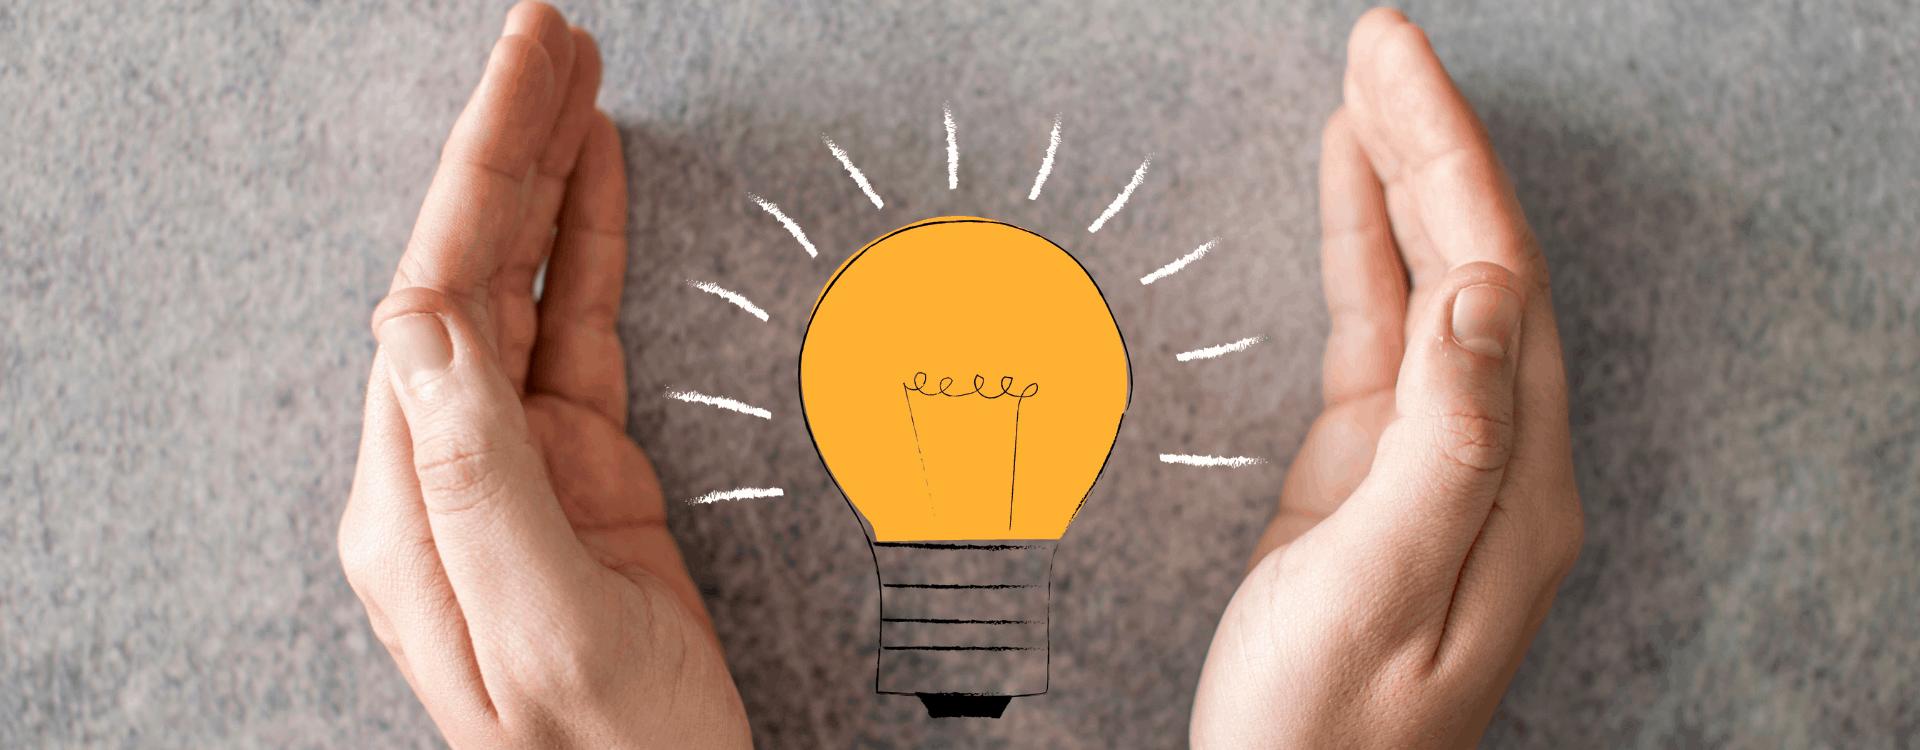 criterios-ahorro-energetico